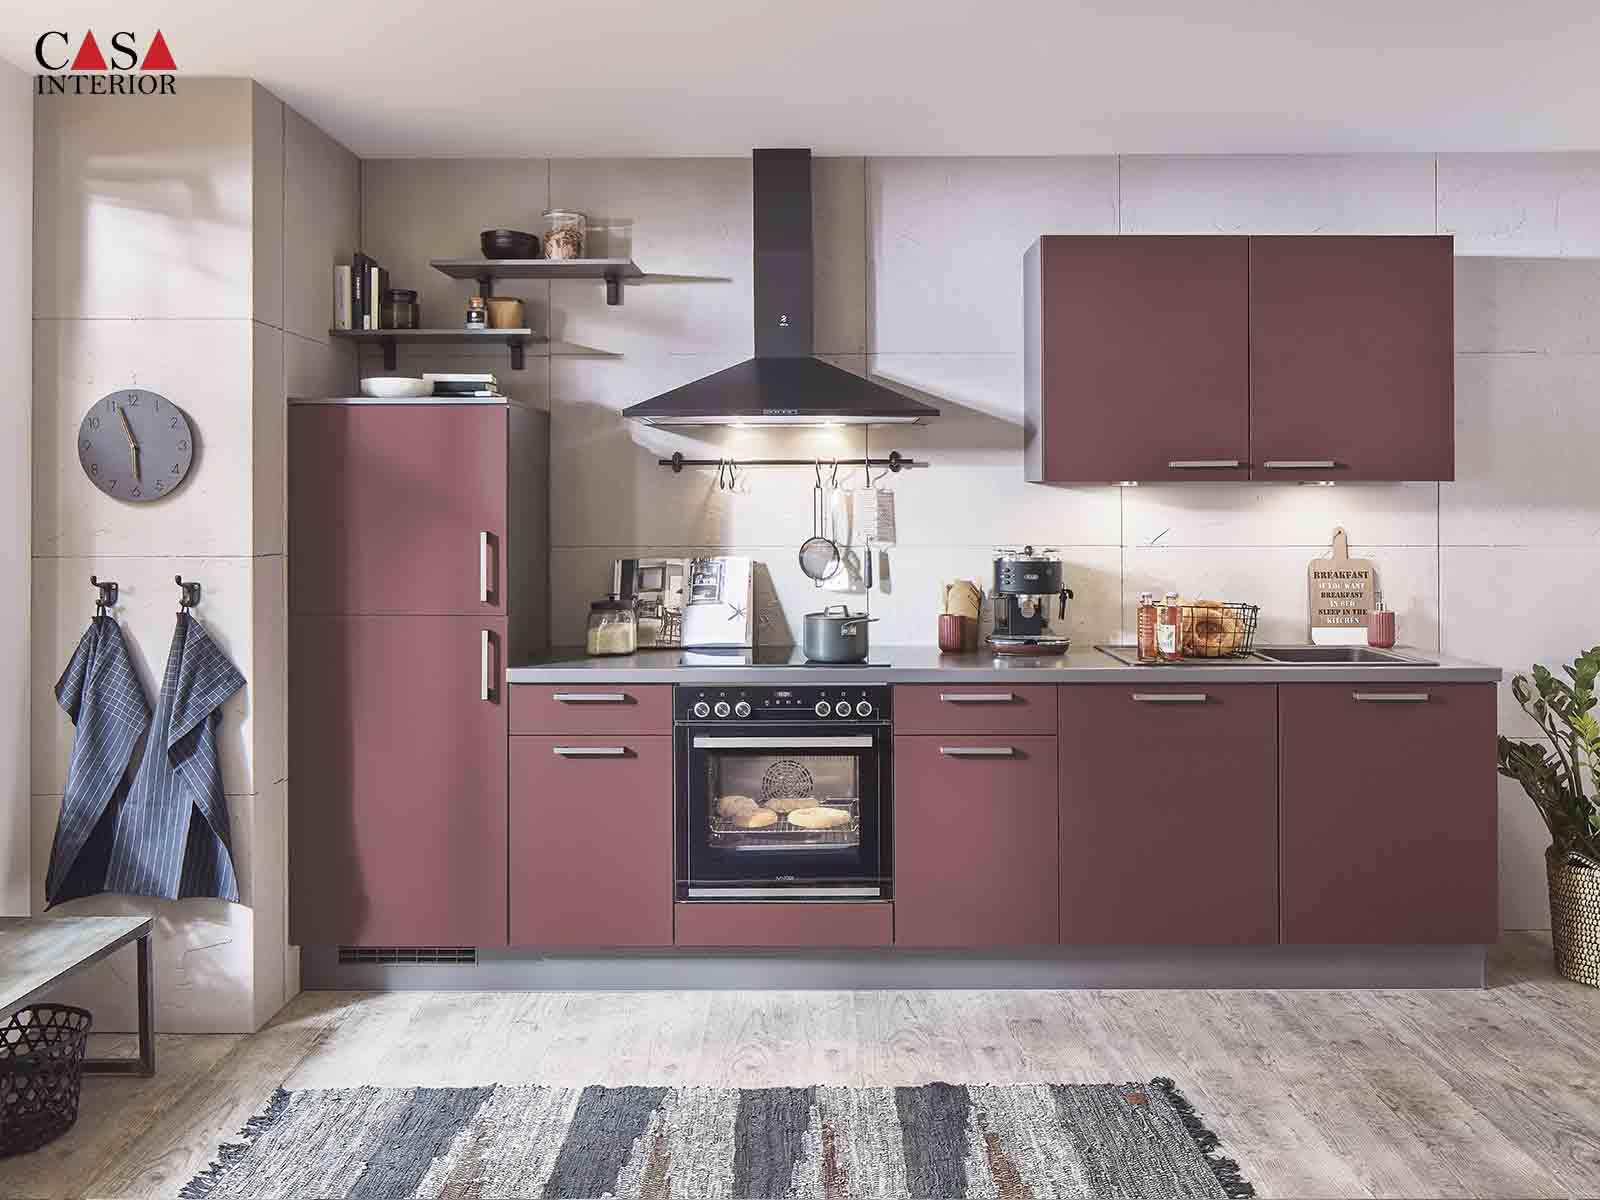 Küchentime Easytouch 963 - 5 - 1